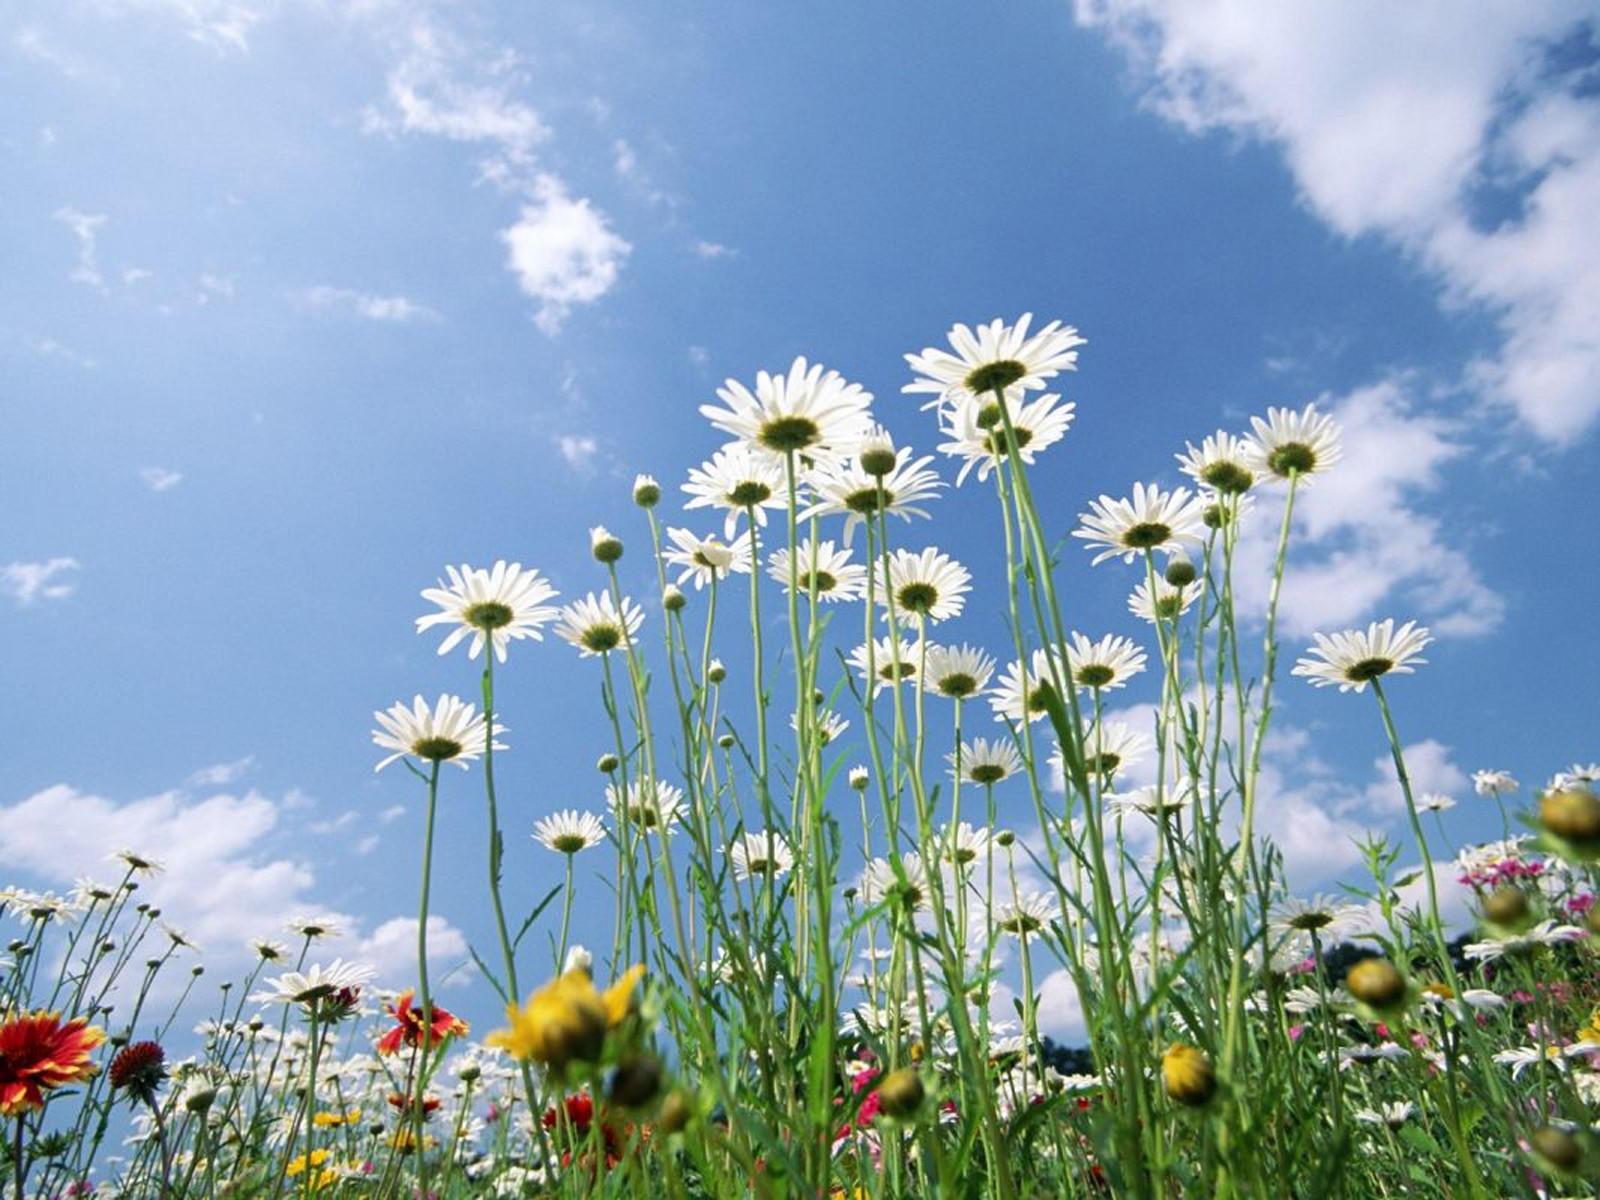 цветочный луг картинки